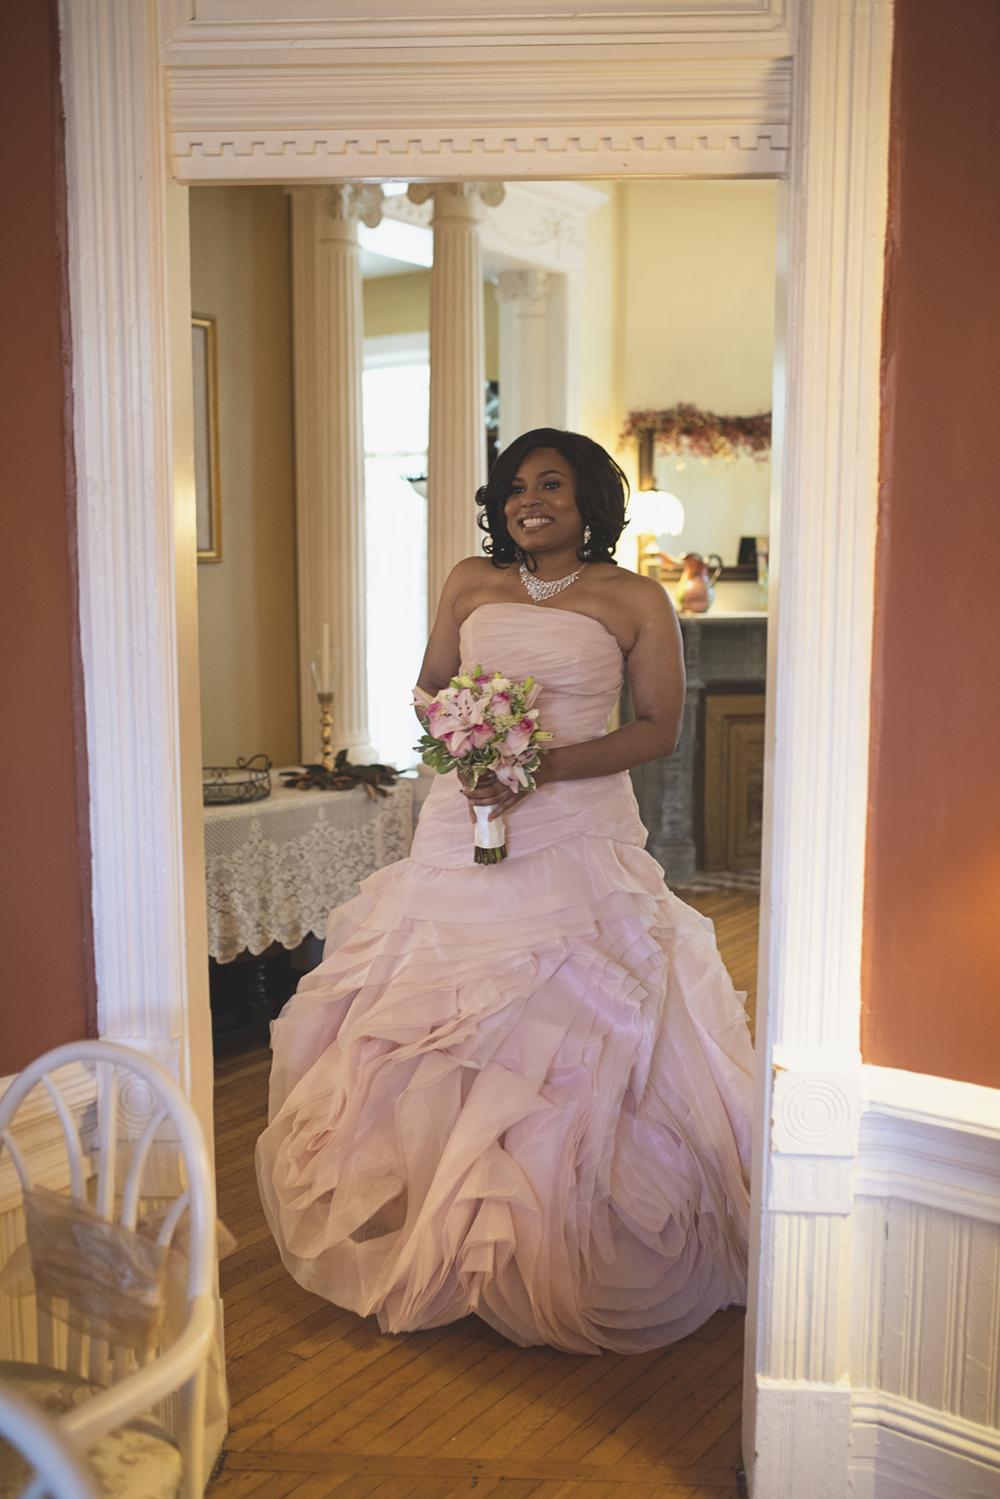 Magnolia House Inn Wedding | Hampton, Virginia Wedding | Wedding ceremony with blude